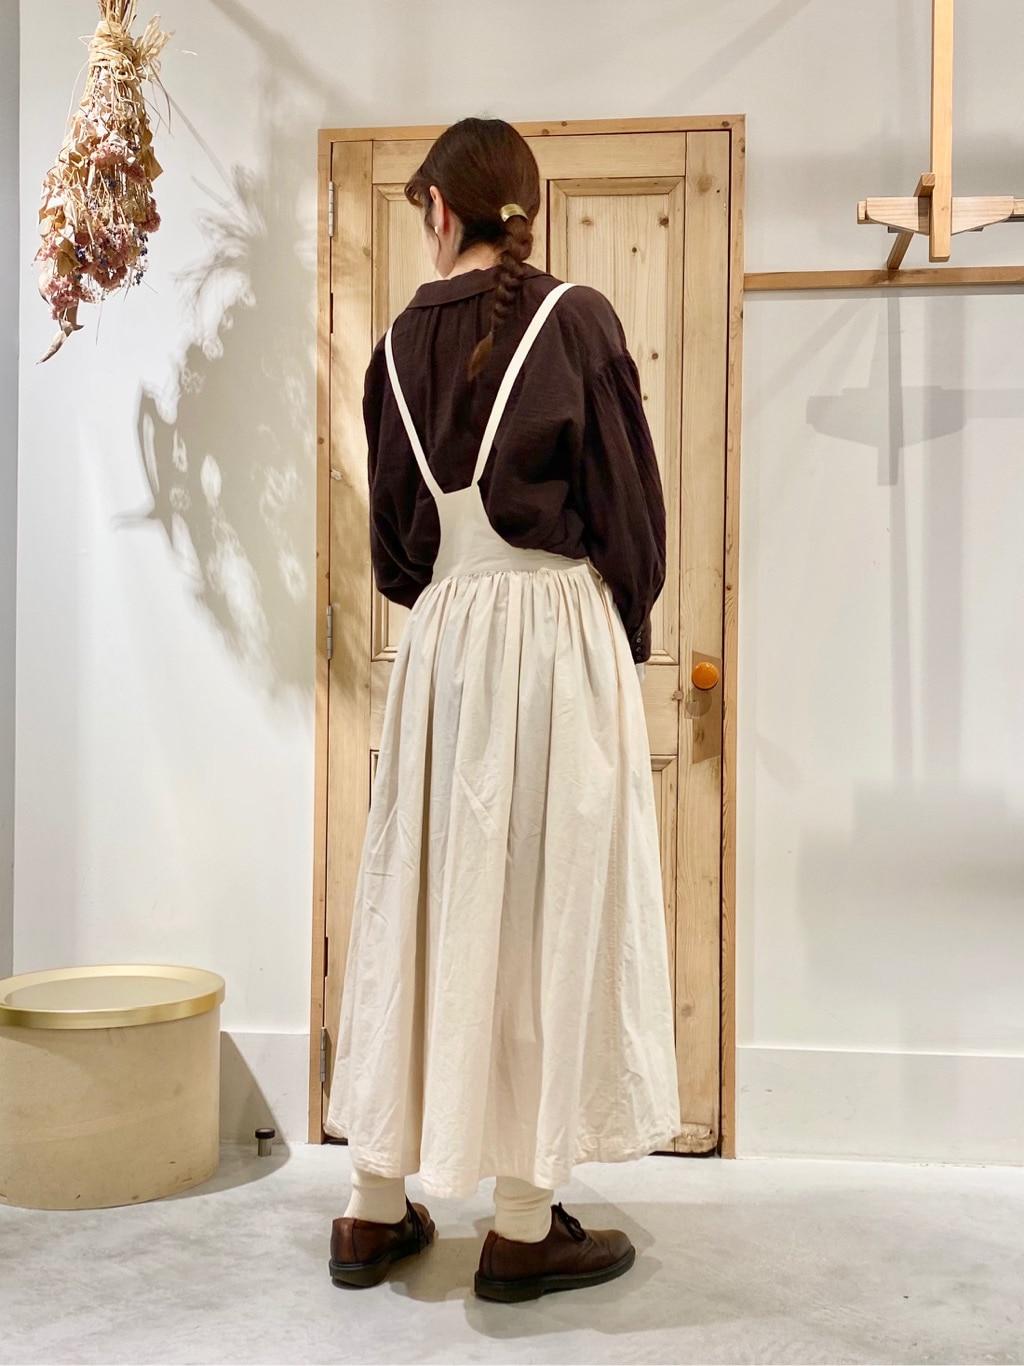 Malle chambre de charme 調布パルコ 身長:167cm 2020.10.06